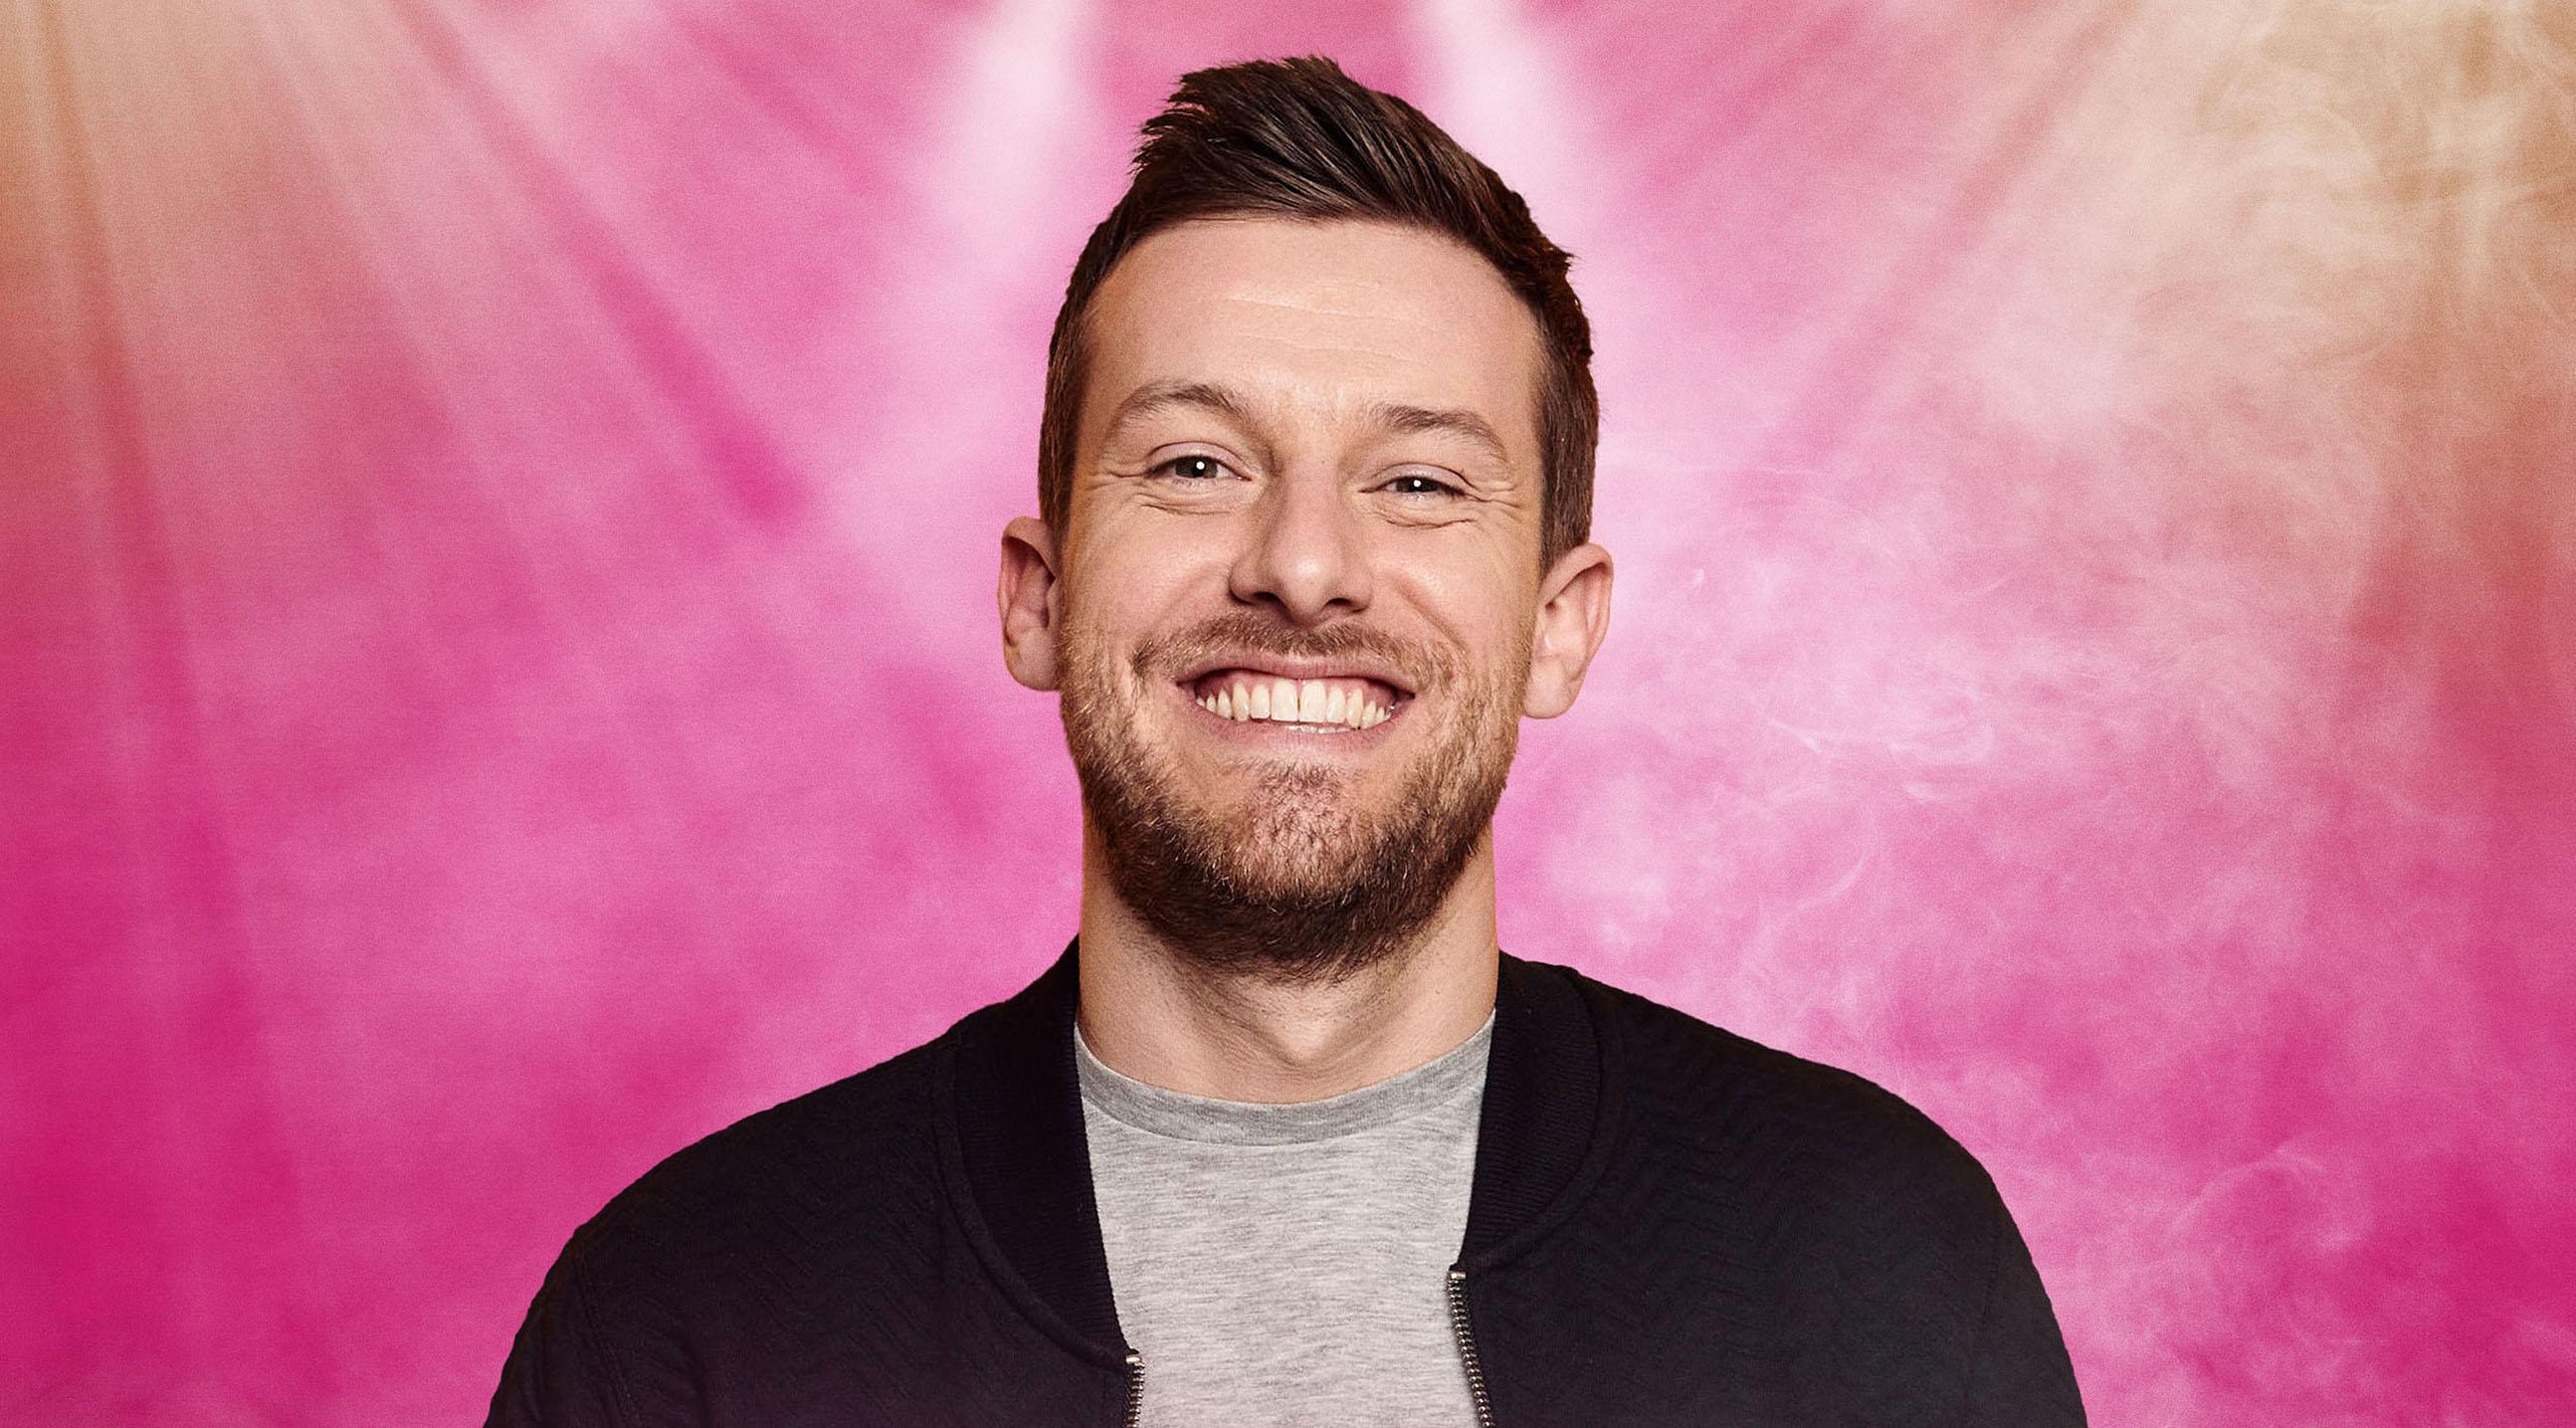 Chris Ramsey returning to Shrewsbury with new show